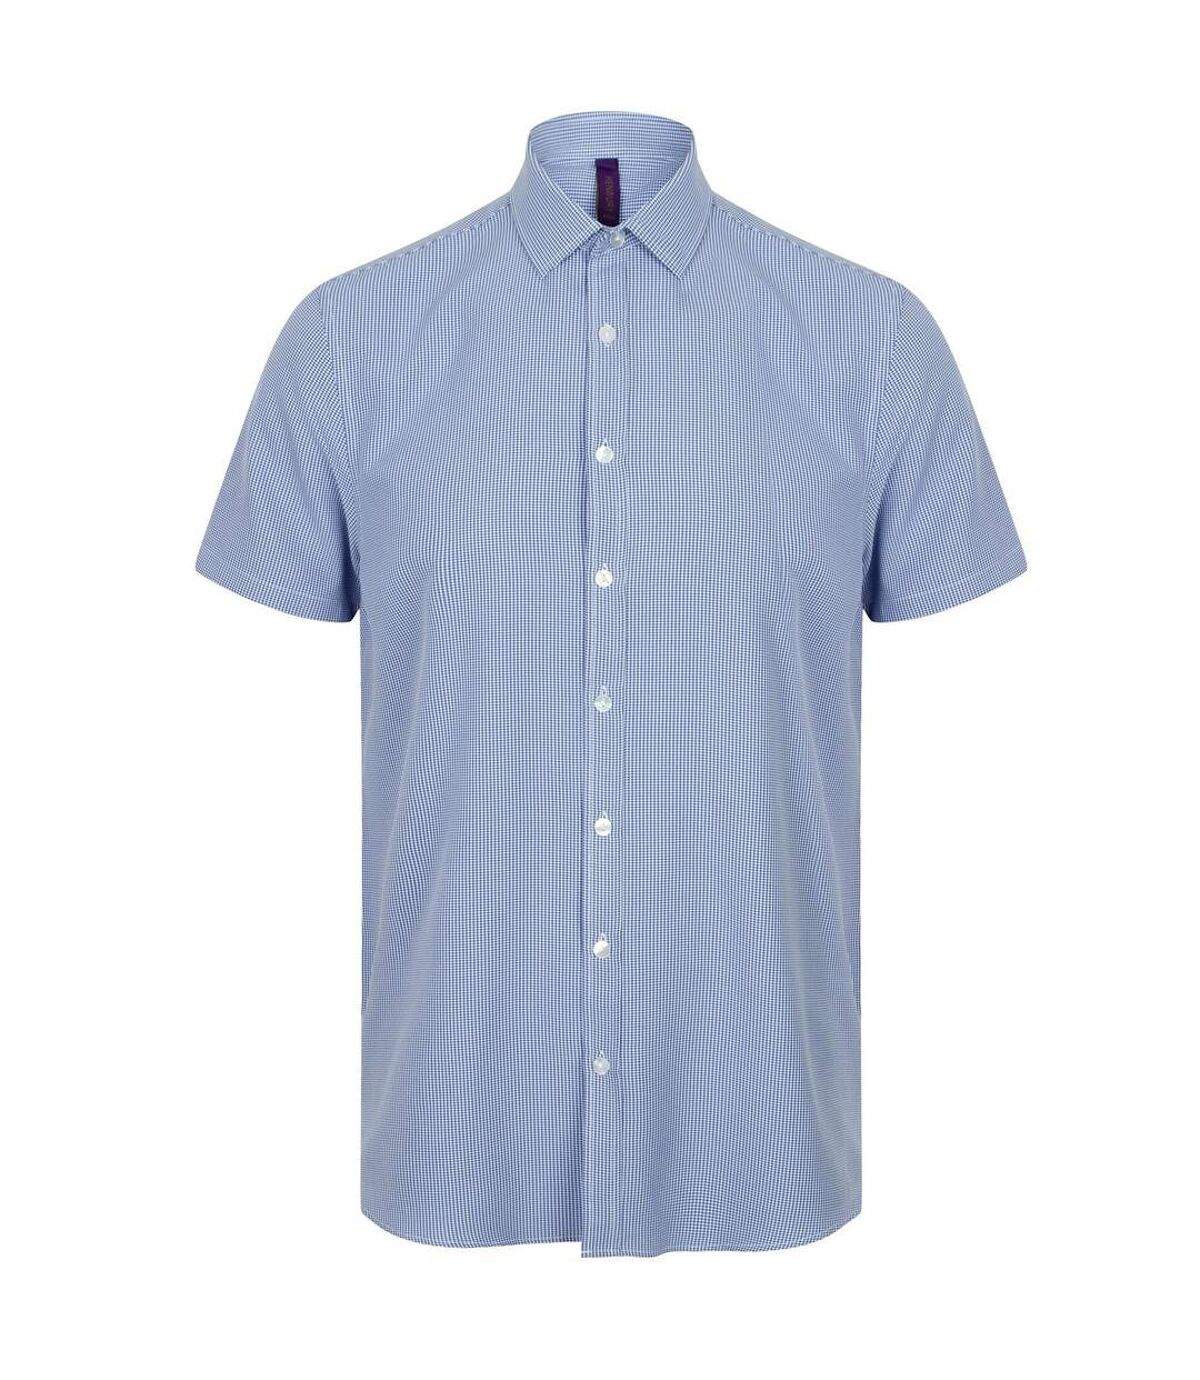 Henbury Mens Gingham Short Sleeve Shirt (Blue/White) - UTPC2955